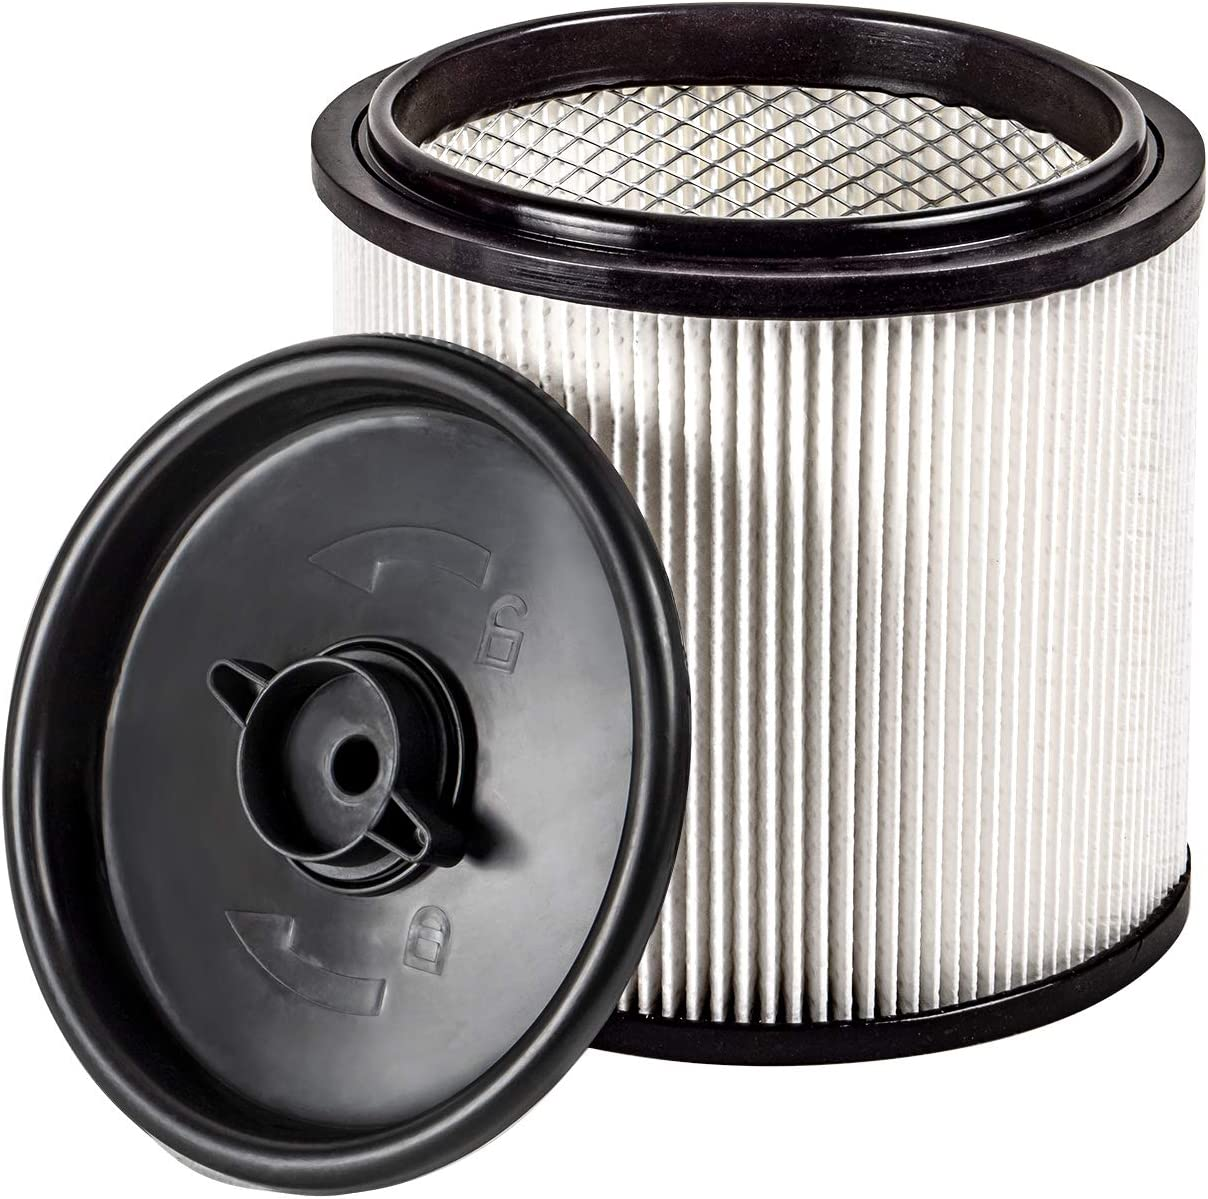 Vacmaster HEPA Material Fine Dust Cartridge Filter & Retainer, VCFH